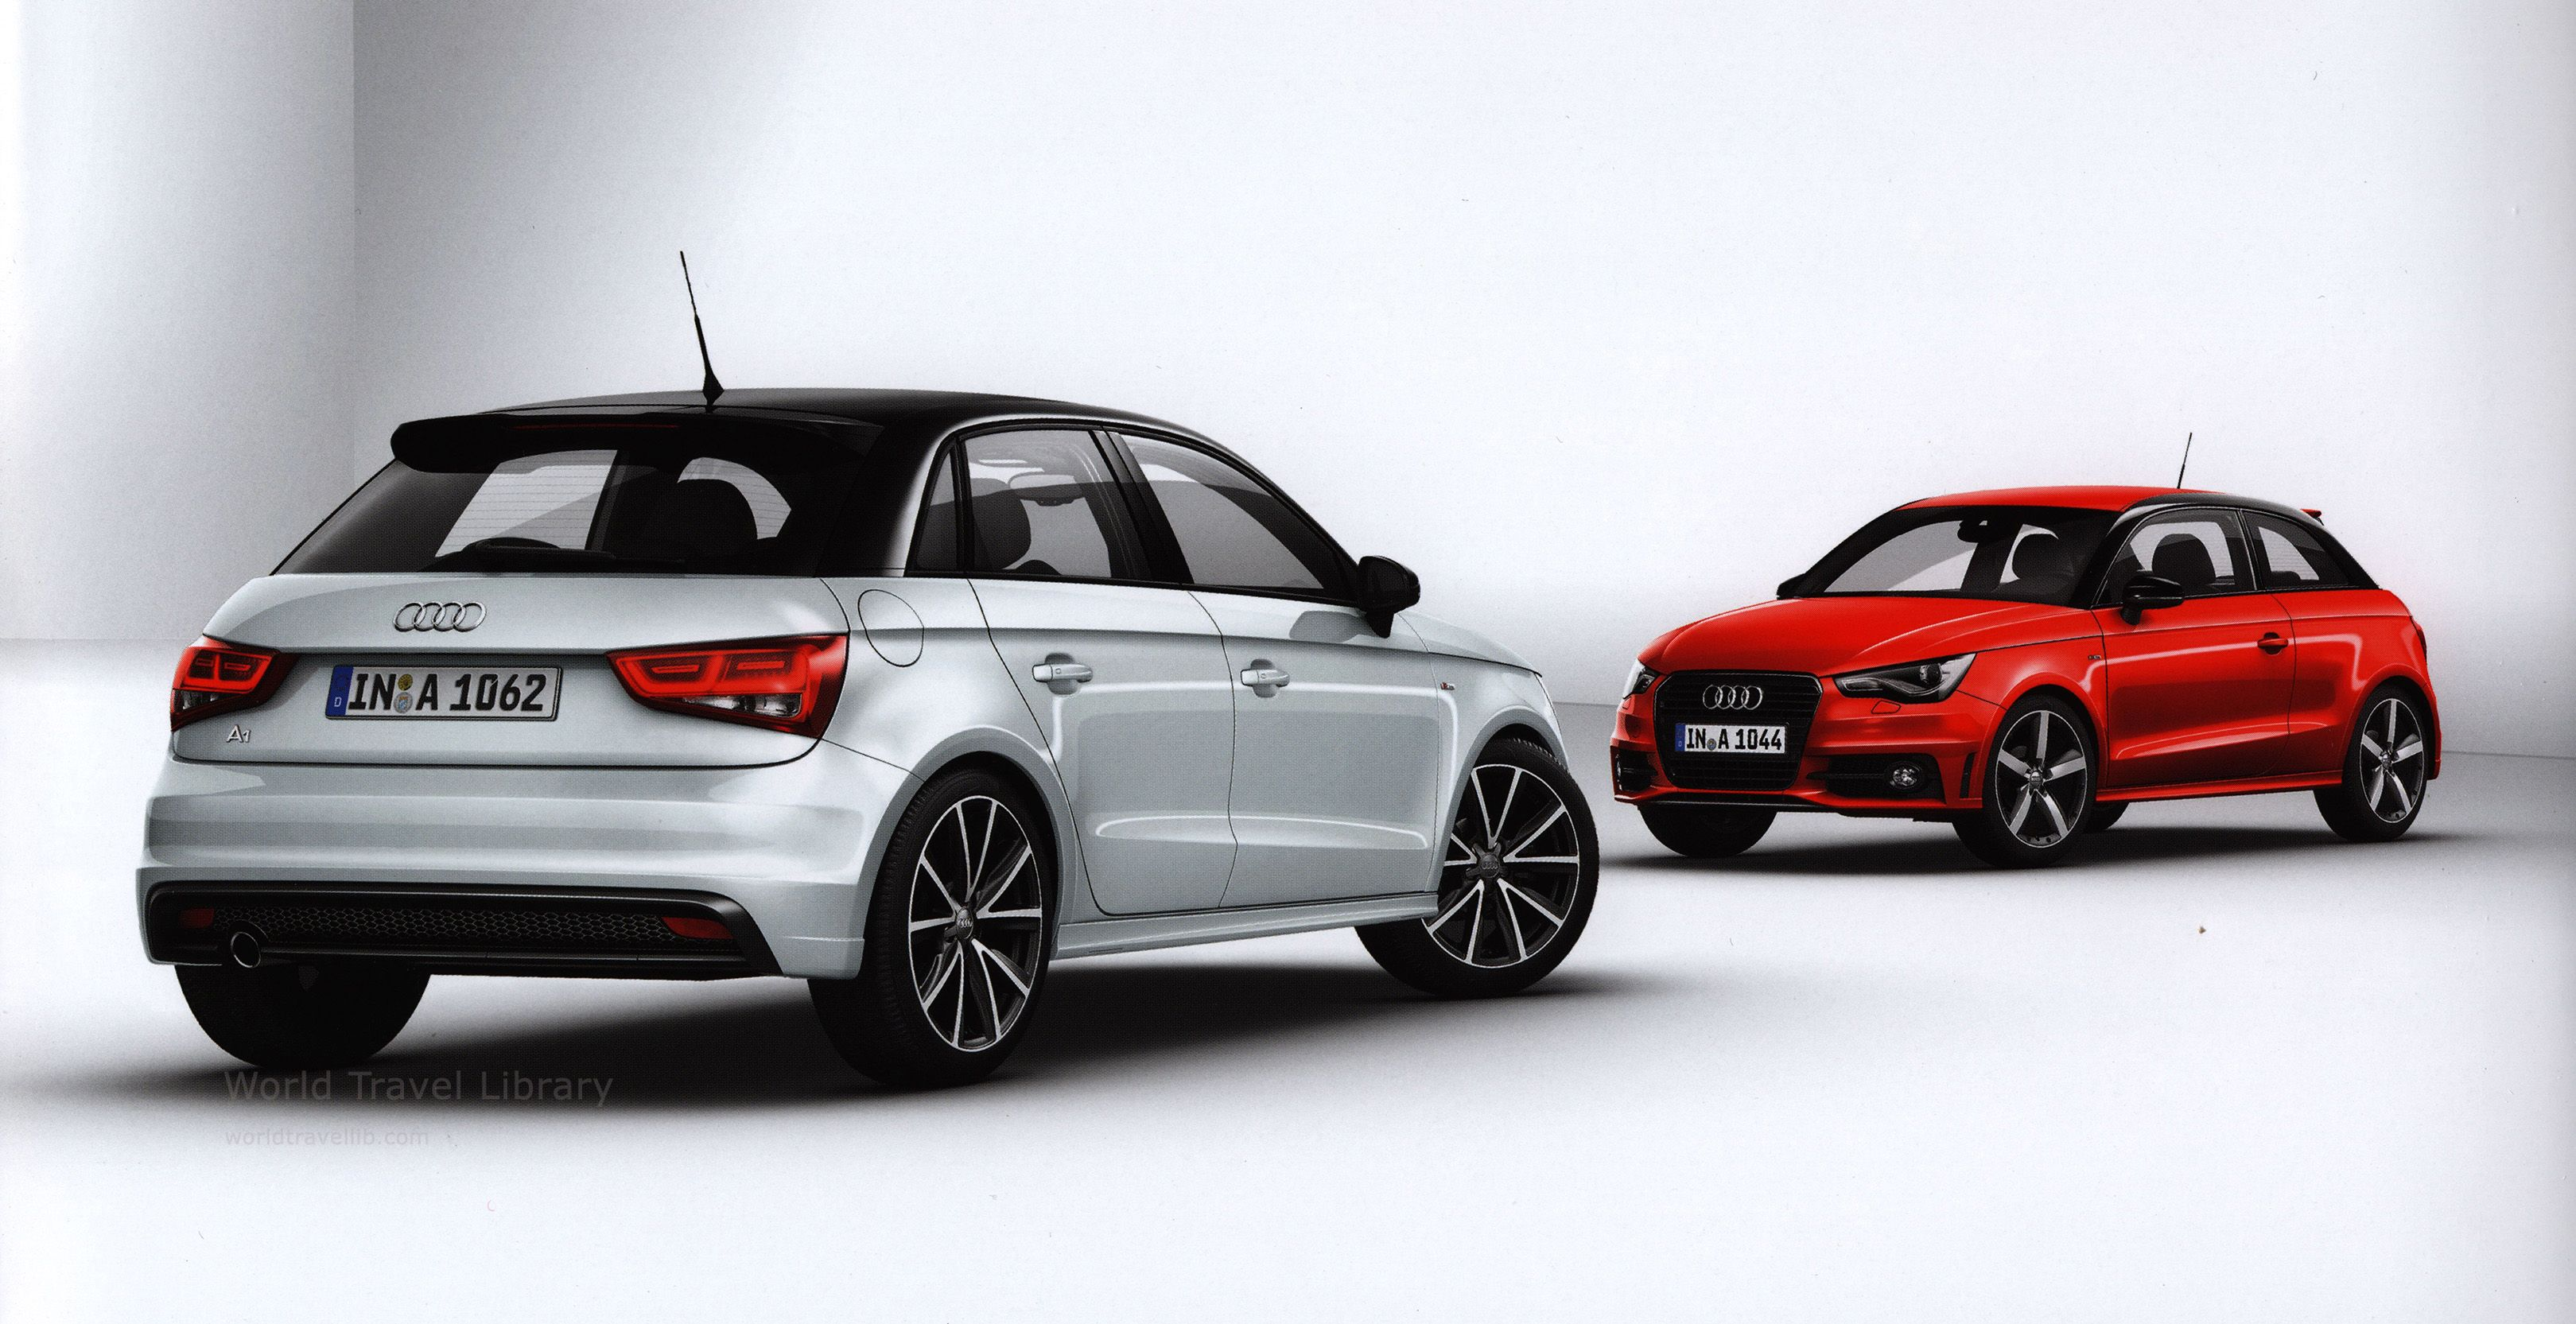 Audi A1 A1 Sportback Admired 2013 2 Car Brochures